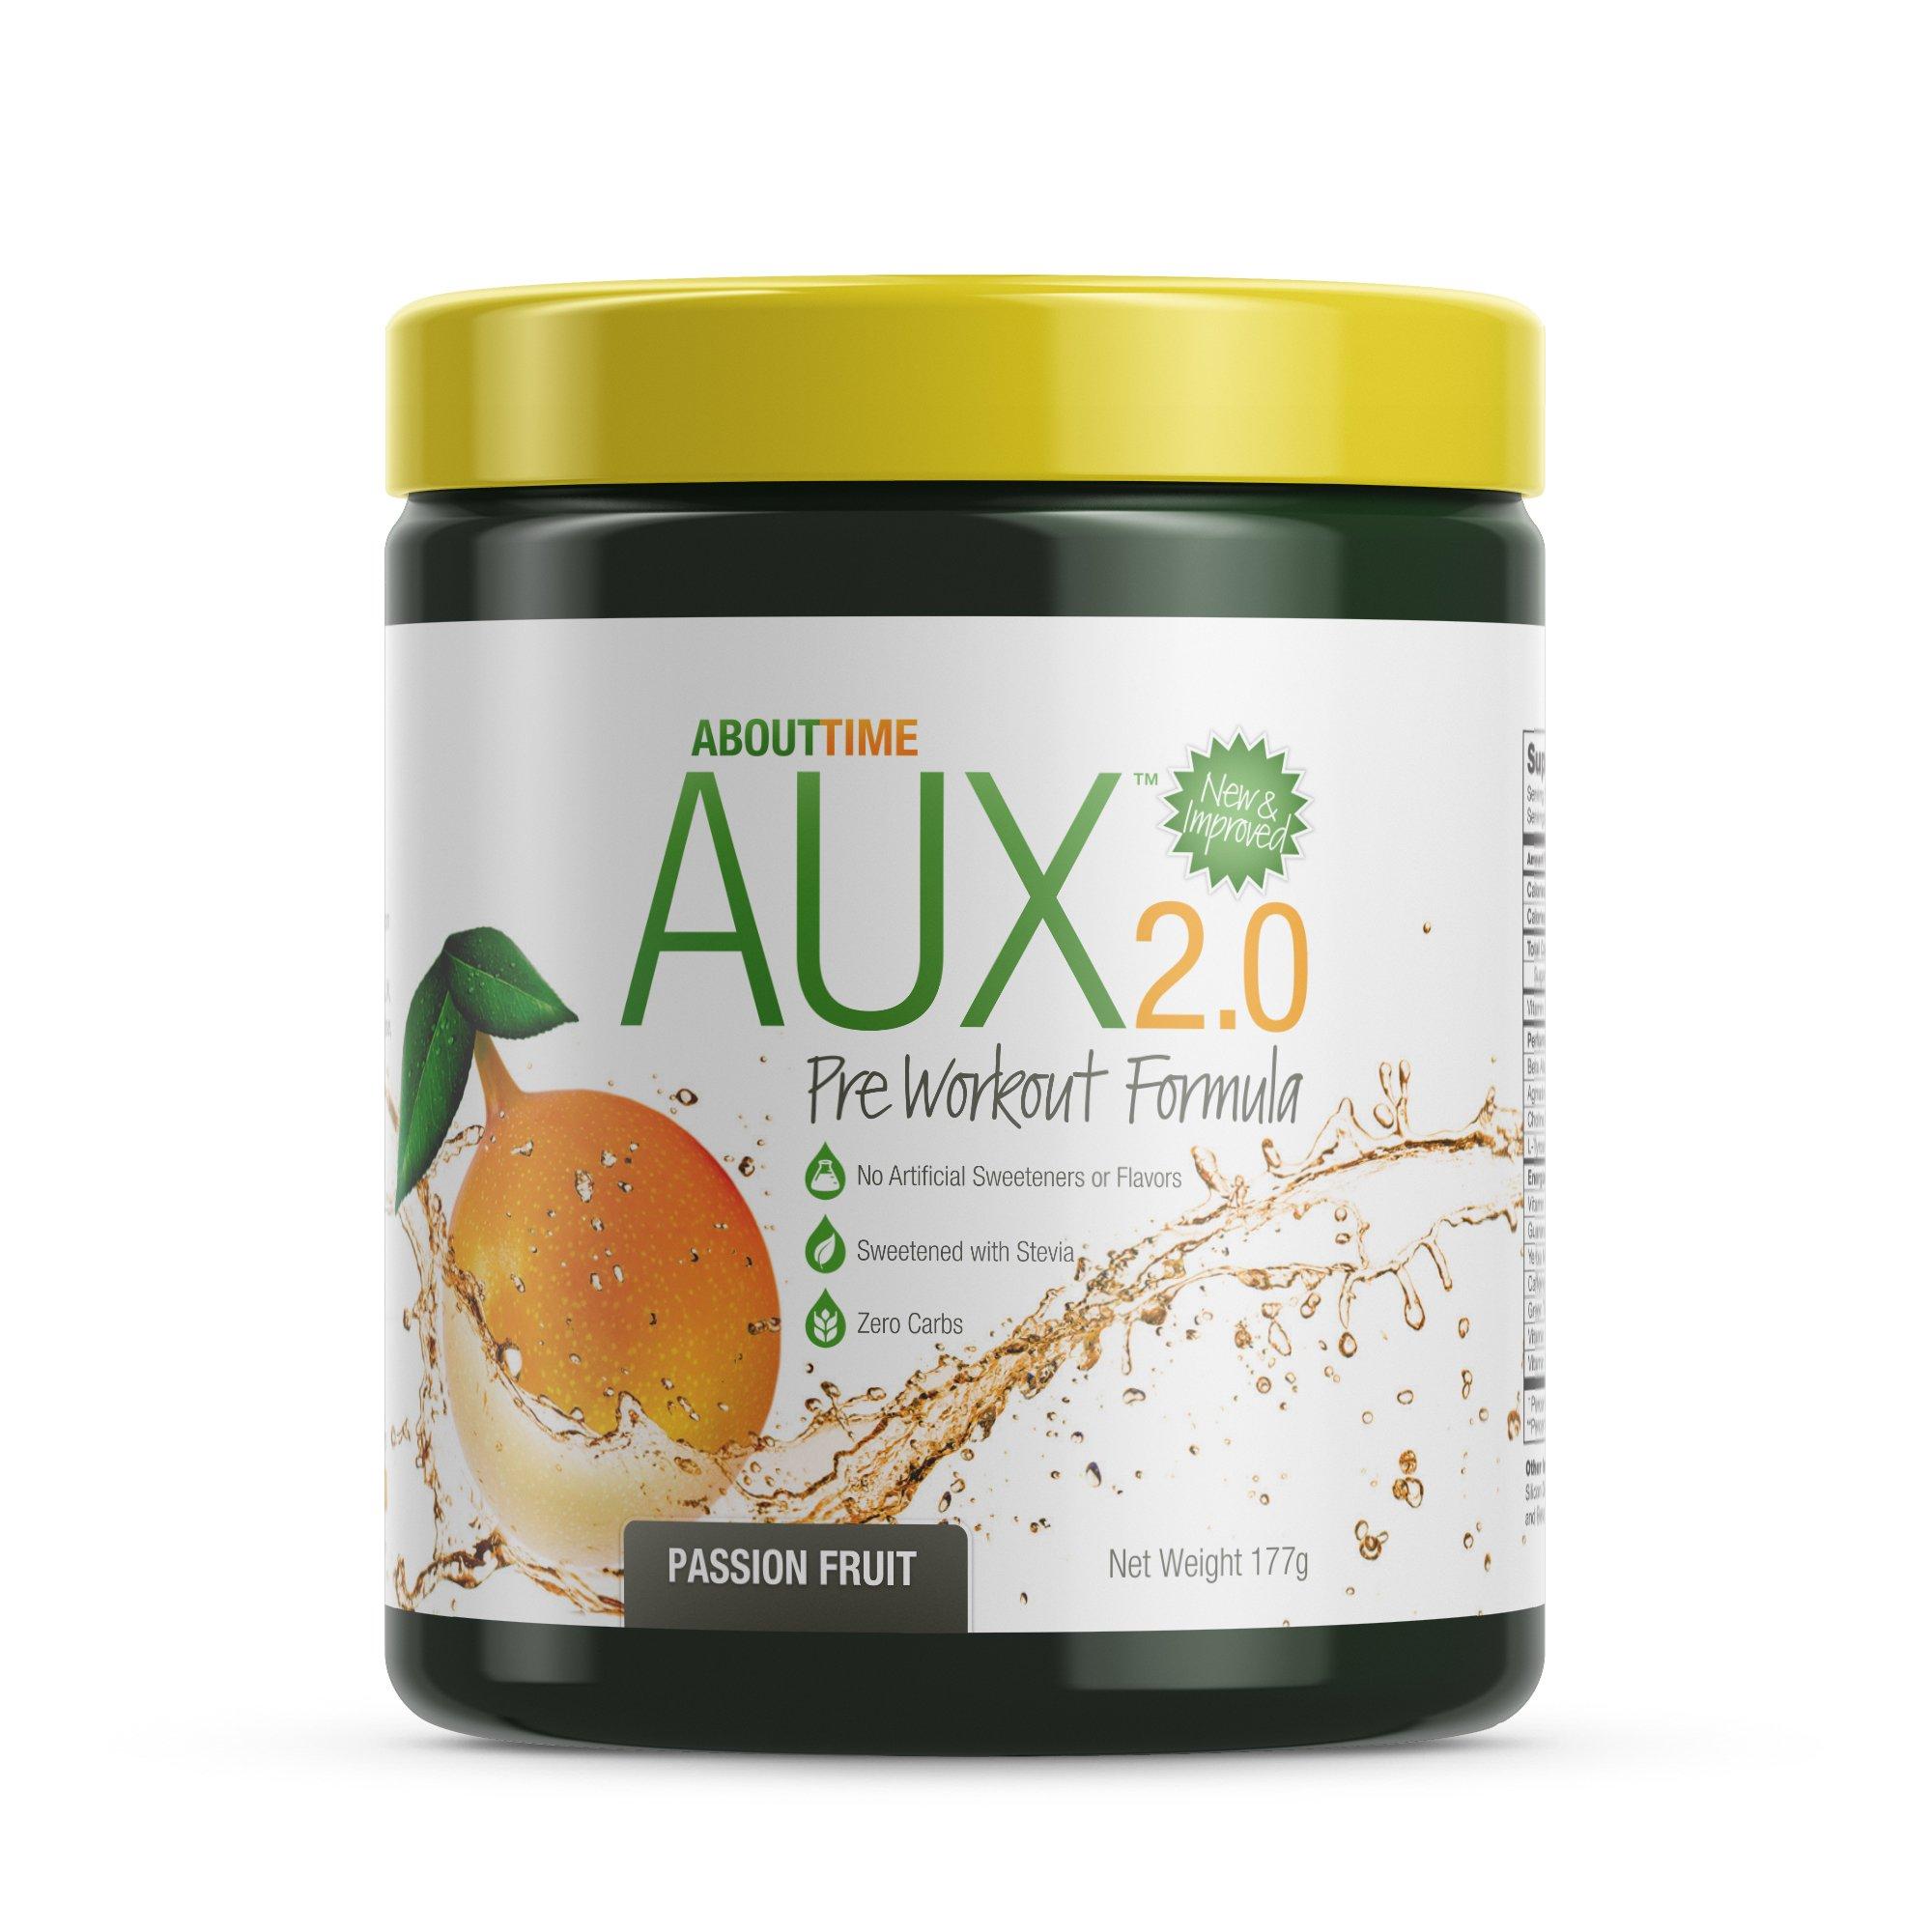 About Time AUX Preworkout Passion Fruit, 30 Servings - Performance Blend, Energize and Restore Formula, 0 Sugars, 0 Calories, 0 Fat